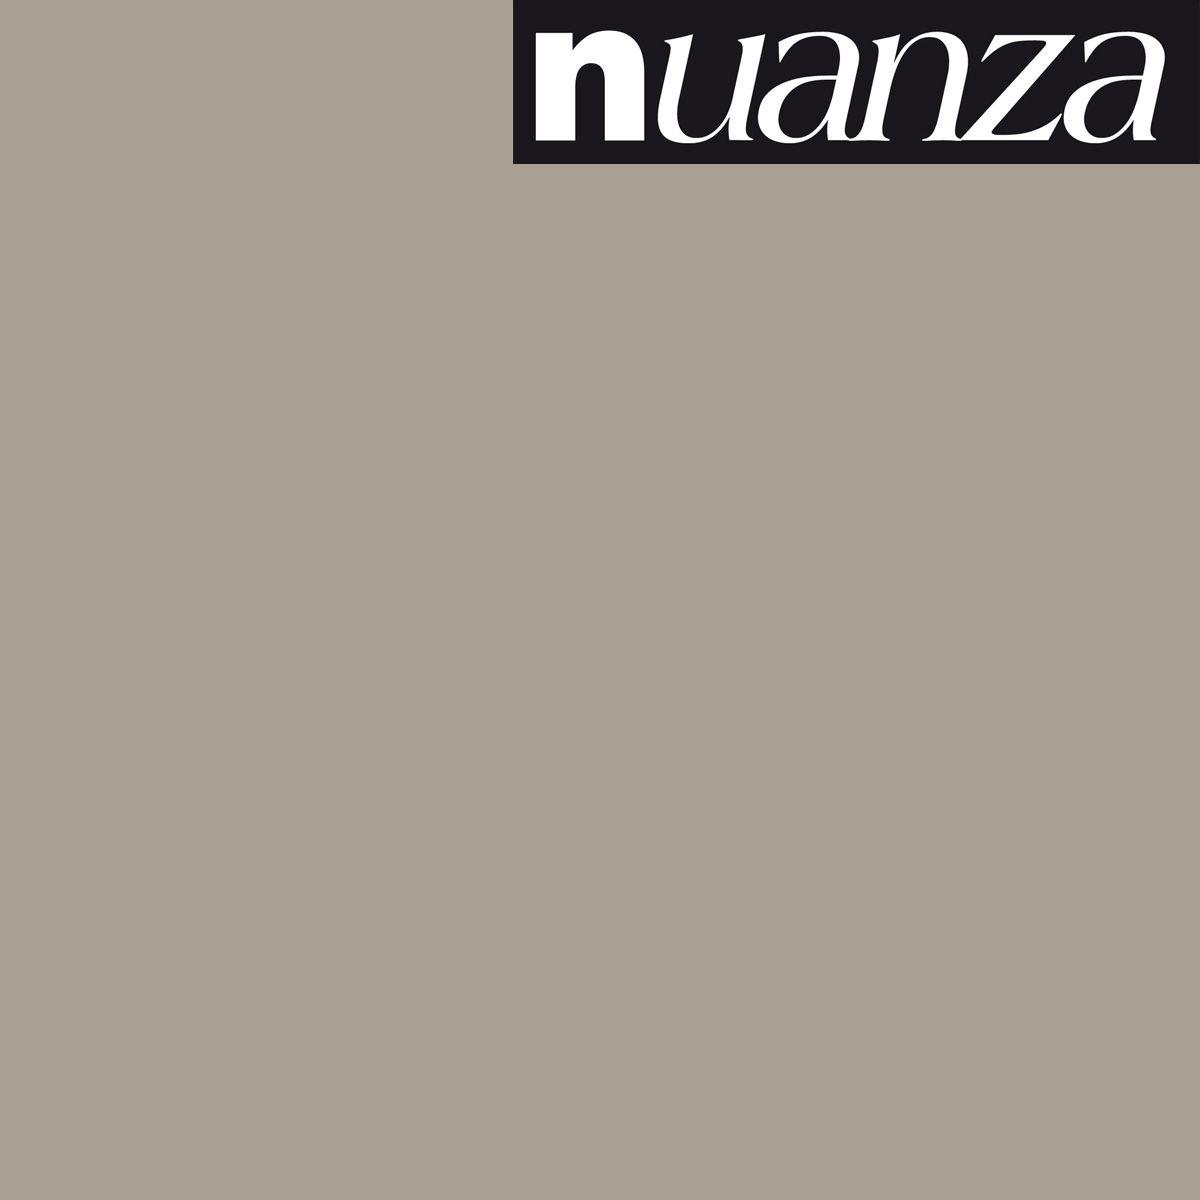 Peinture taupe satin multisupports Nuanza 0.5l